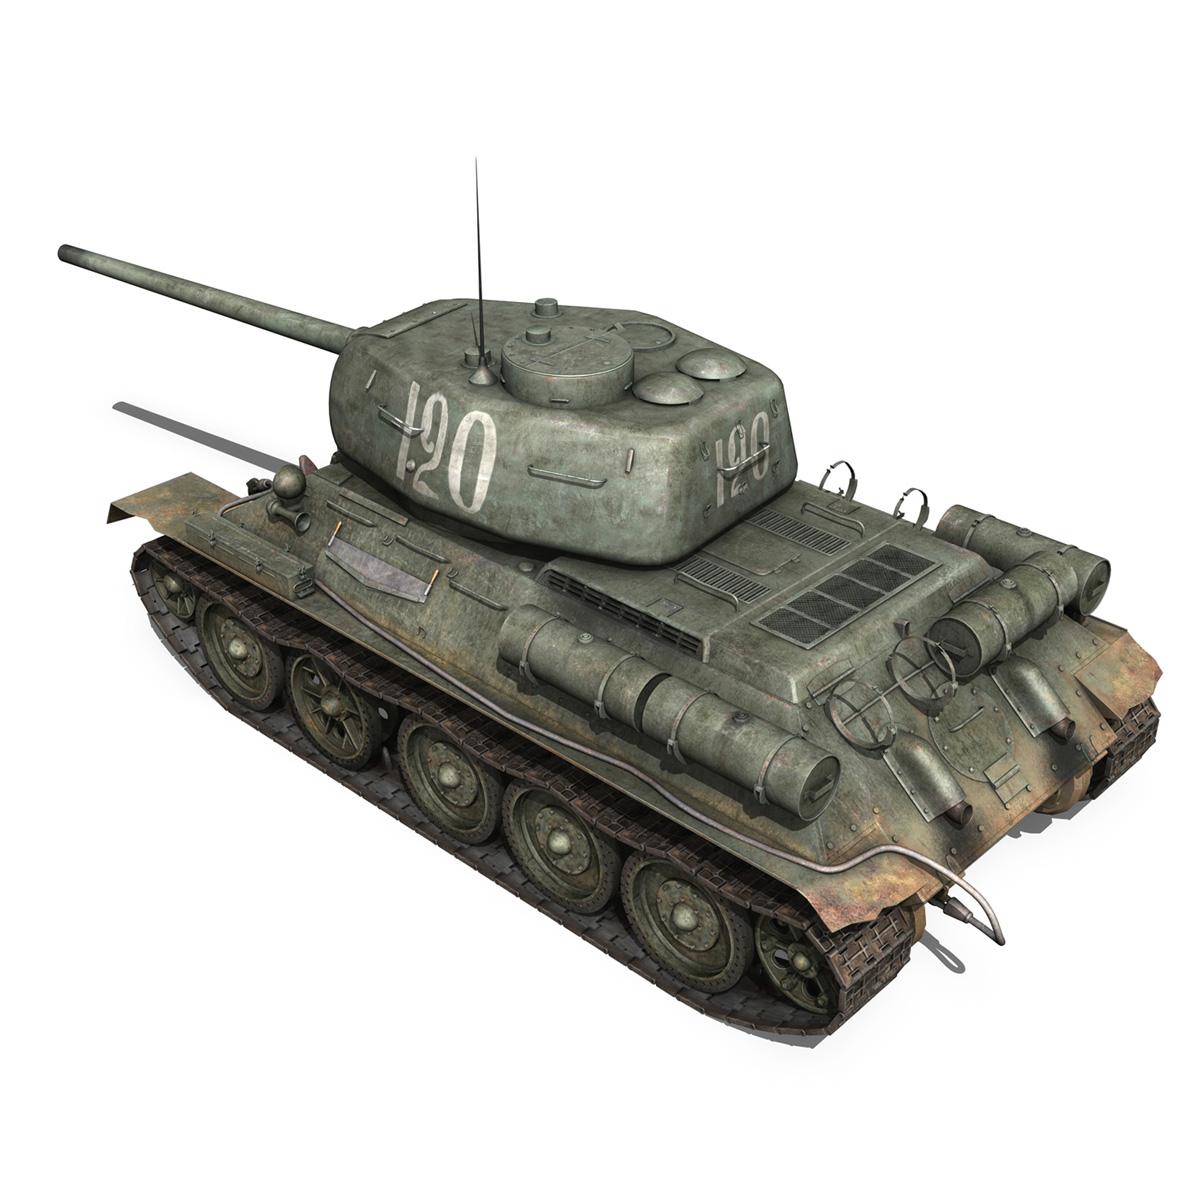 t-34 85 – soviet medium tank – 120 3d model 3ds fbx lwo lw lws obj c4d 265372